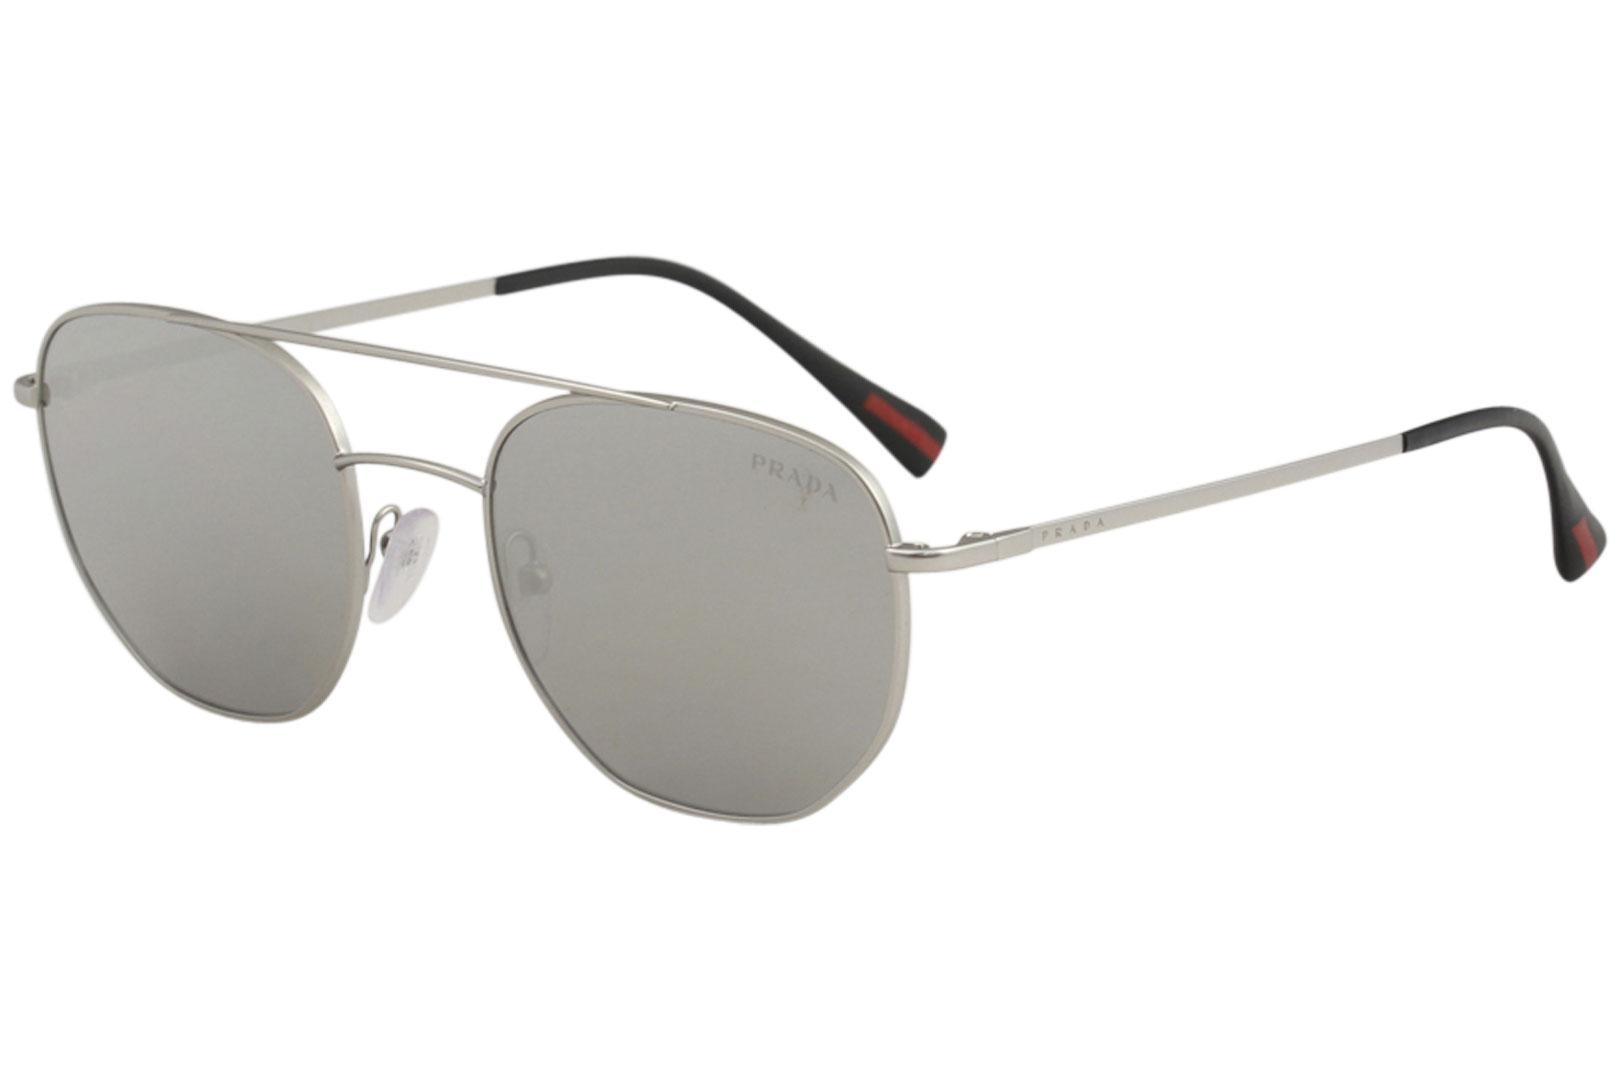 3a2d6f2ebc83 Prada Linea Rossa Men s SPS56S SPS 56S Fashion Pilot Sunglasses